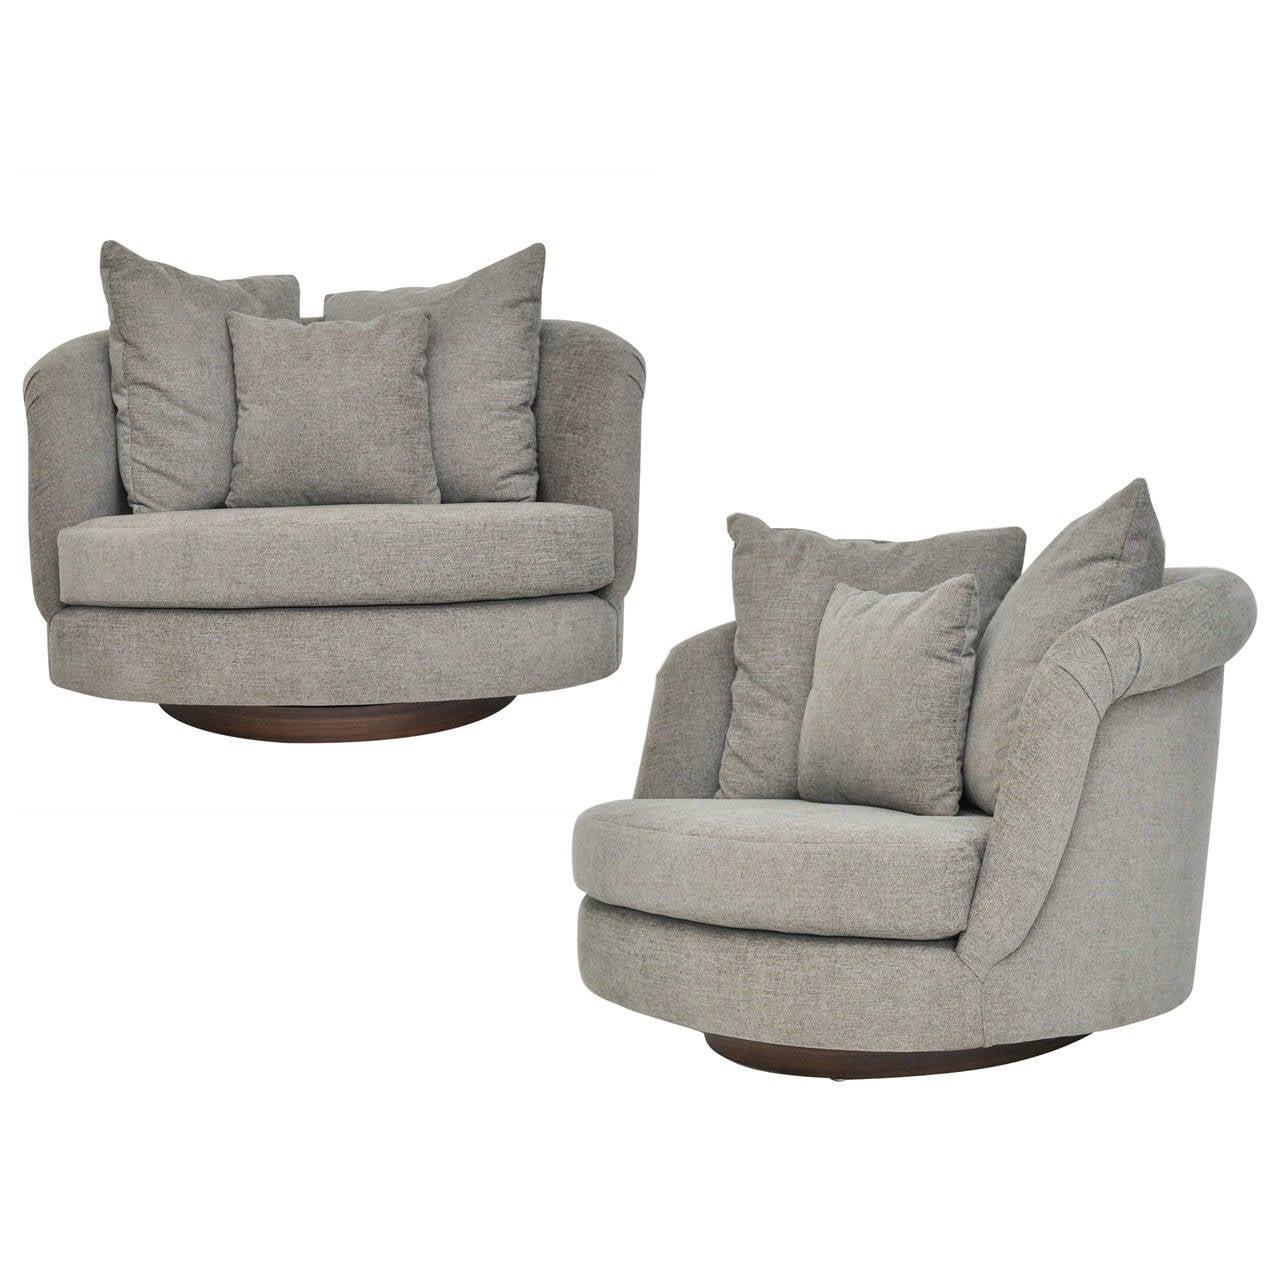 Pair of Large Milo Baughman Swivel Chairs 1